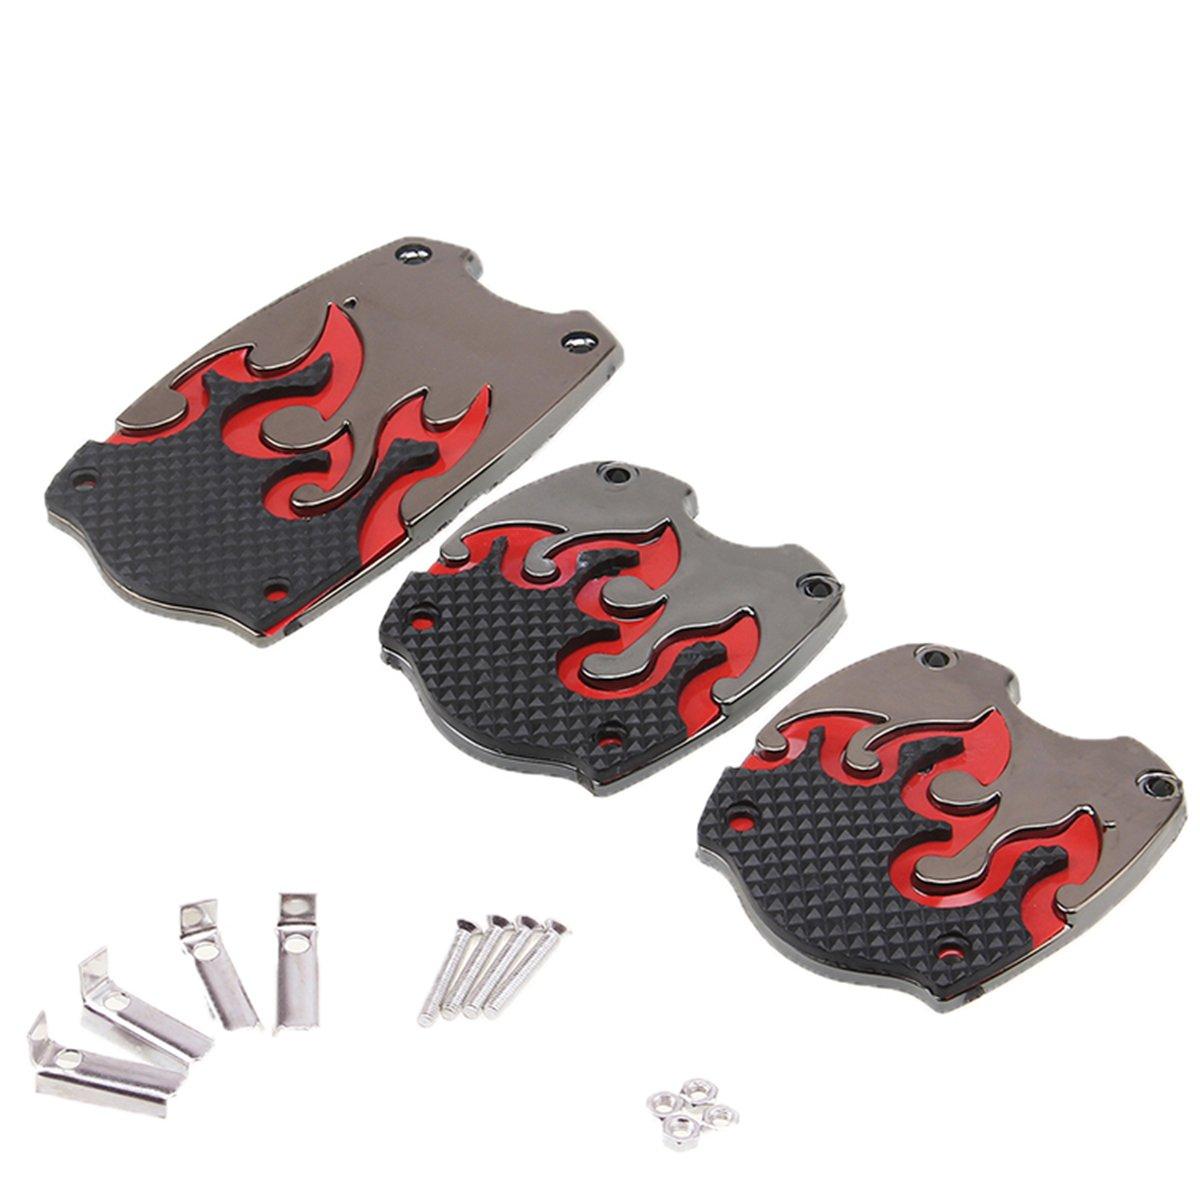 Possbay 3PCS Car Gas Brake Clutch Pedal Non-Slip Foot Treadle Cover Pad Universal